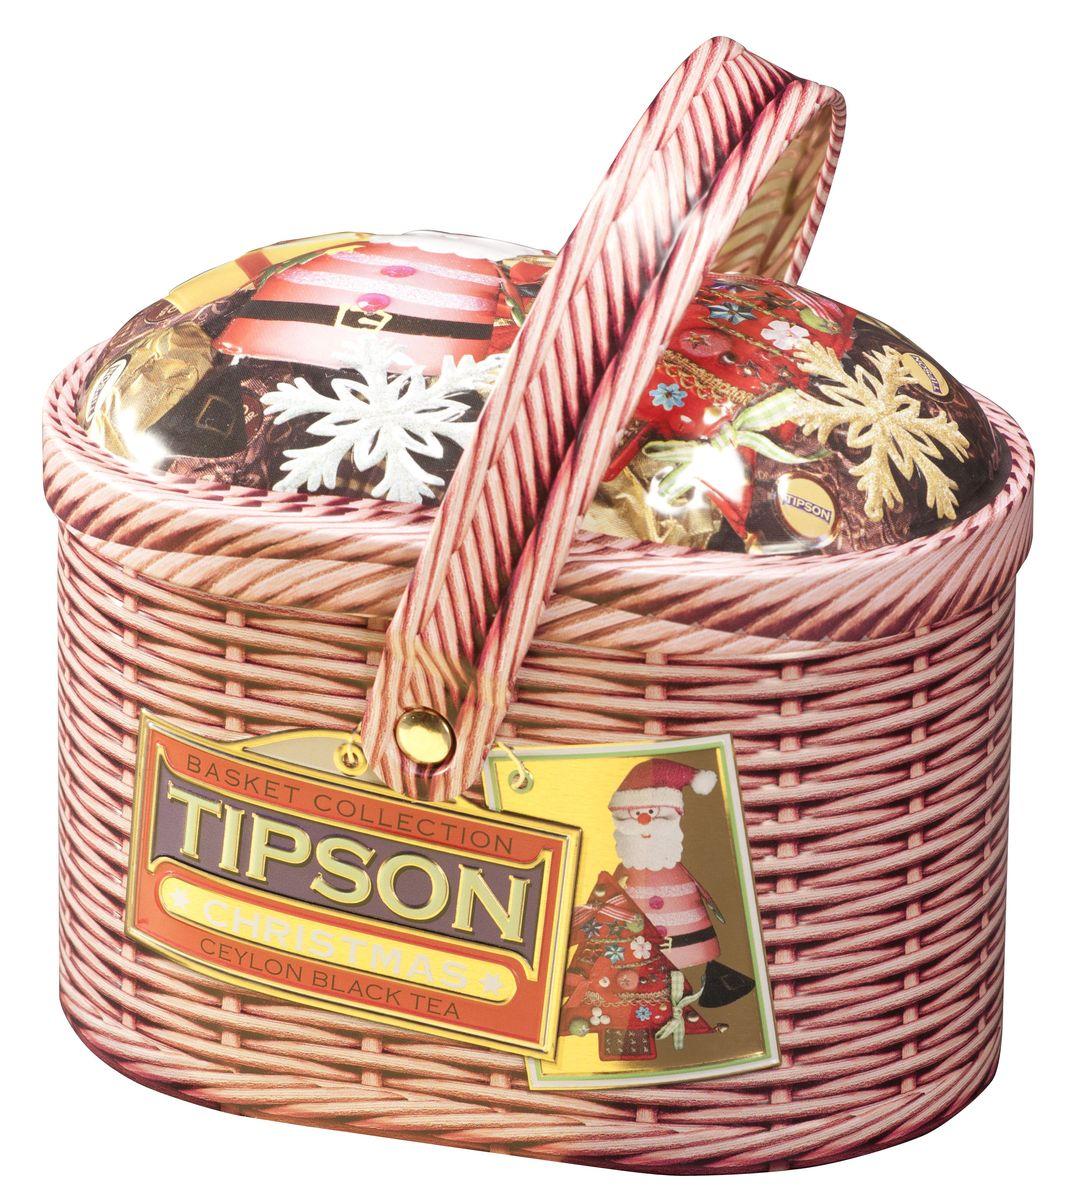 Tipson Christmas черный листовой чай, 100 г (жестяная банка) tipson империал 3 чайный набор стеклянный чайник и чай 50 г